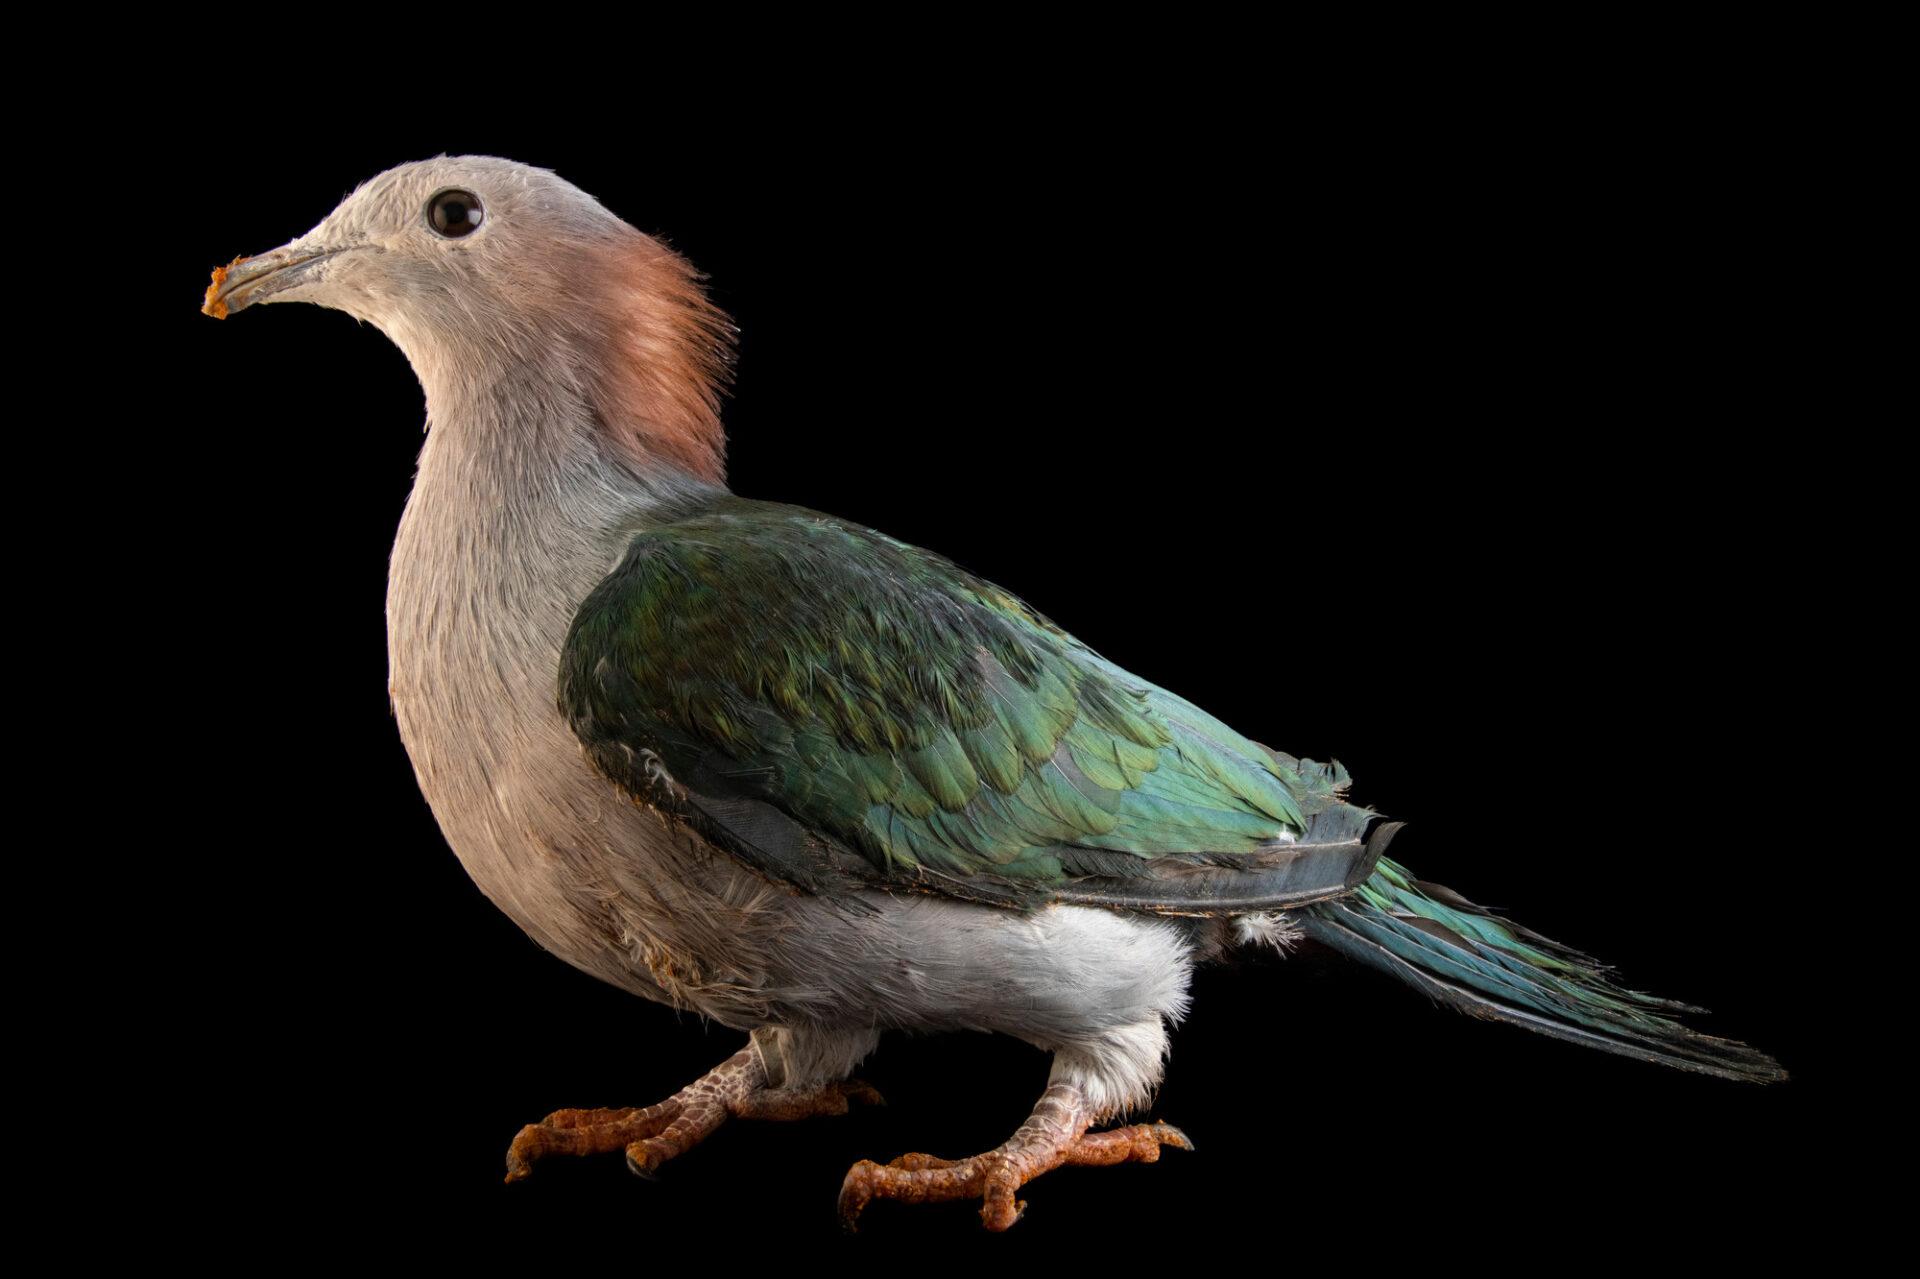 Photo: A chestnut-naped imperial pigeon (Ducula aenea paulina) at the Prague Zoo.